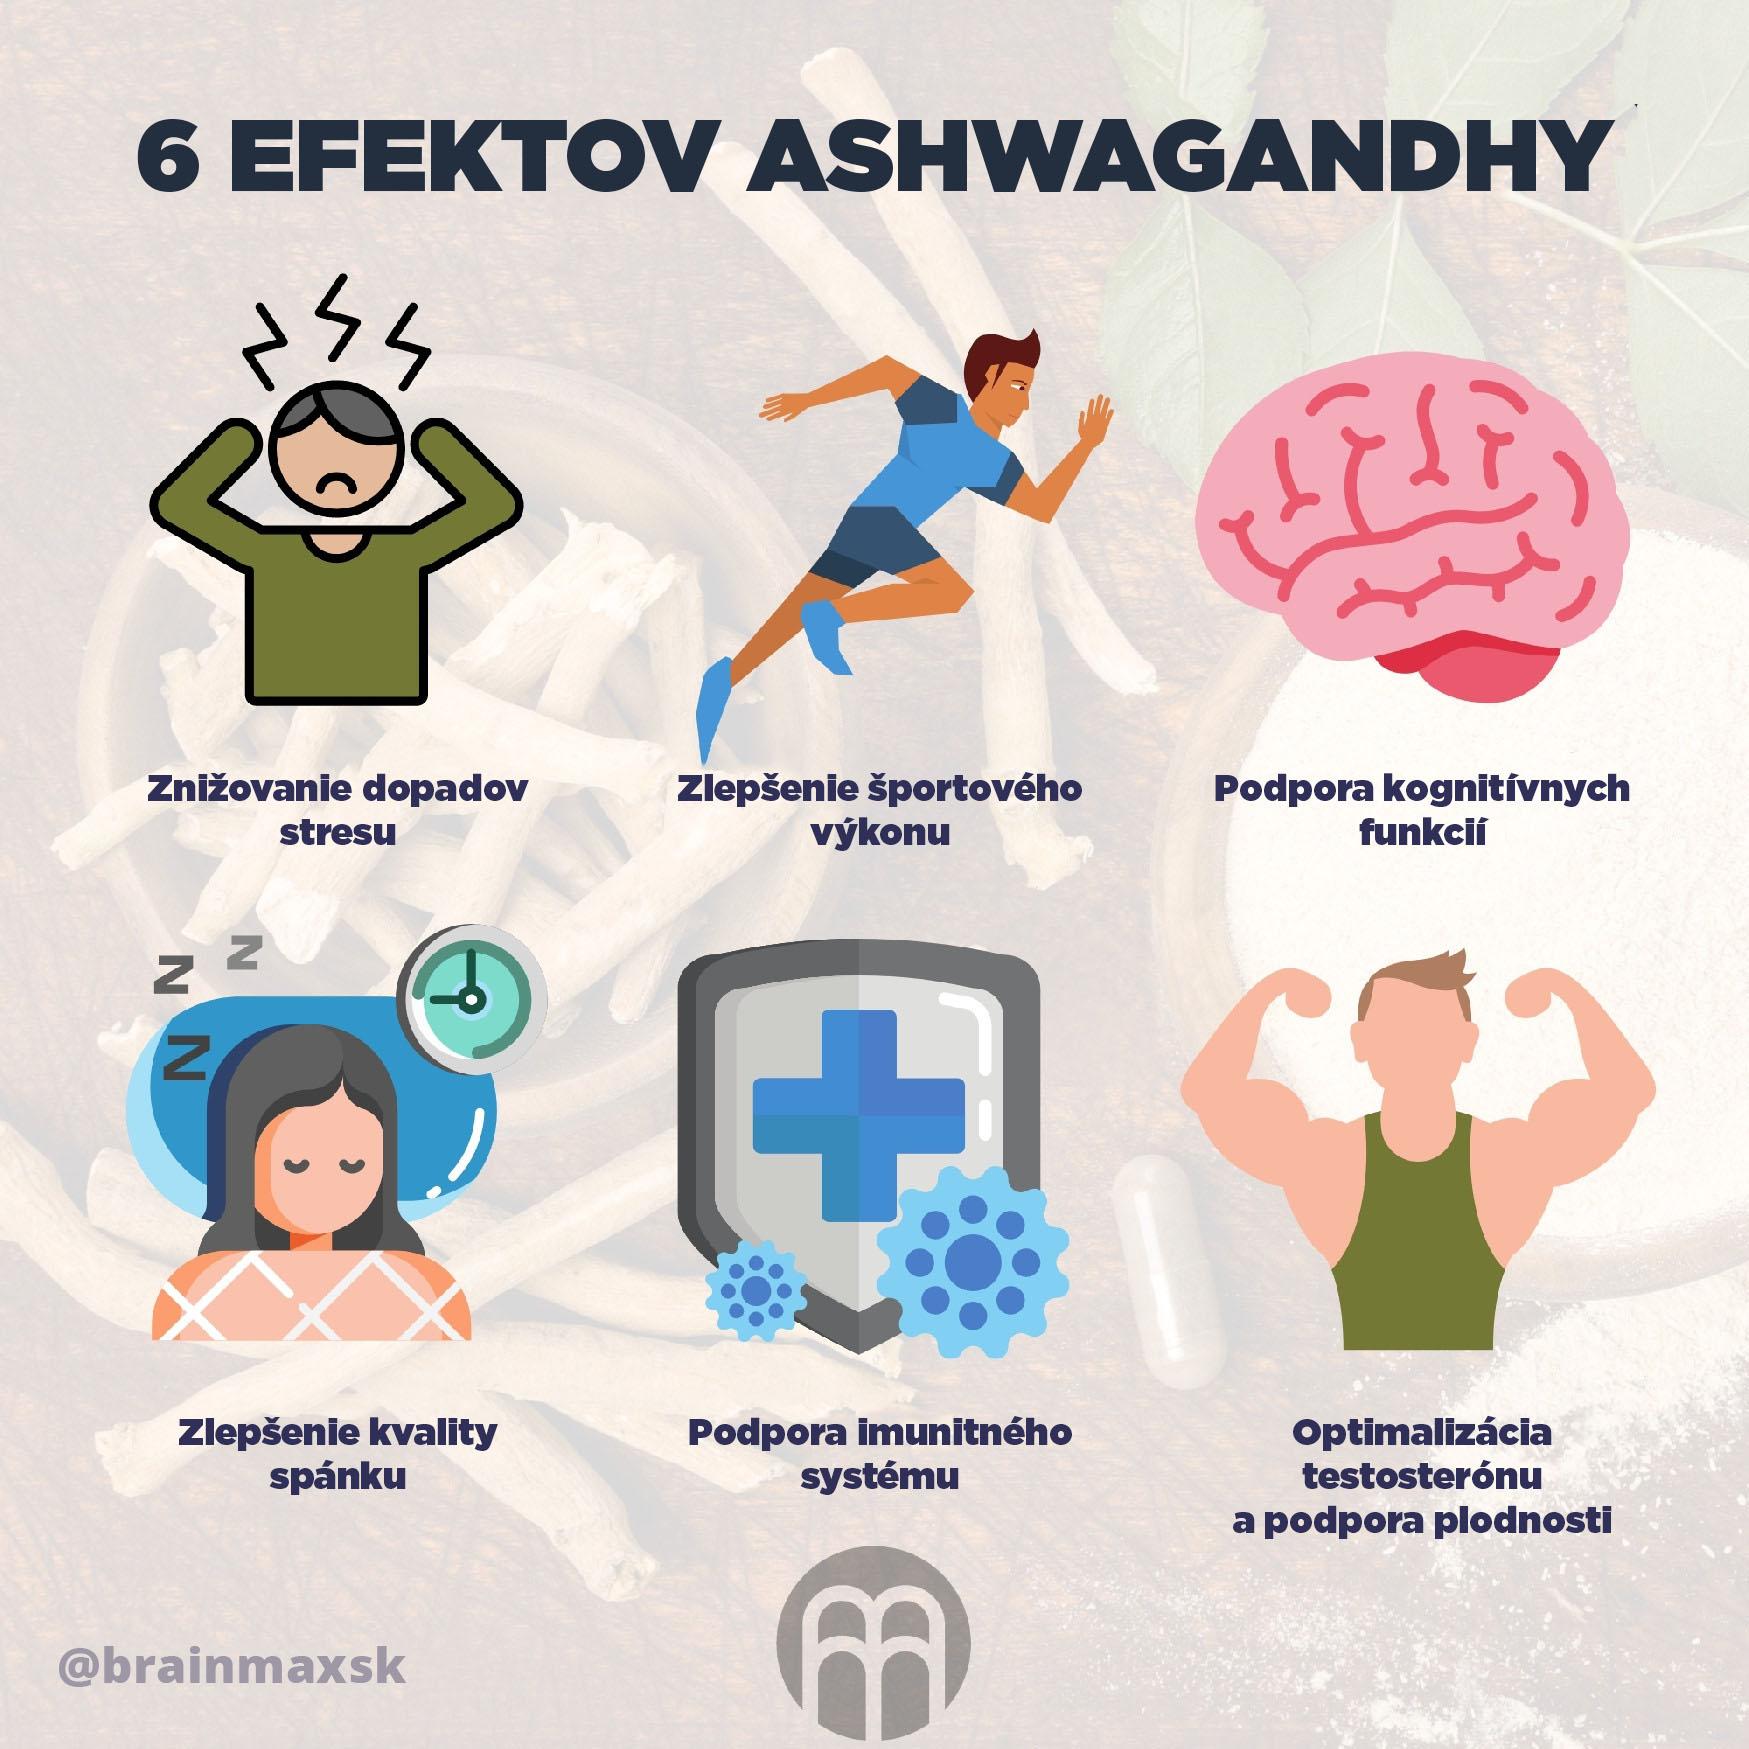 efektov-ashwagandhy-infografika-brainmax-sk